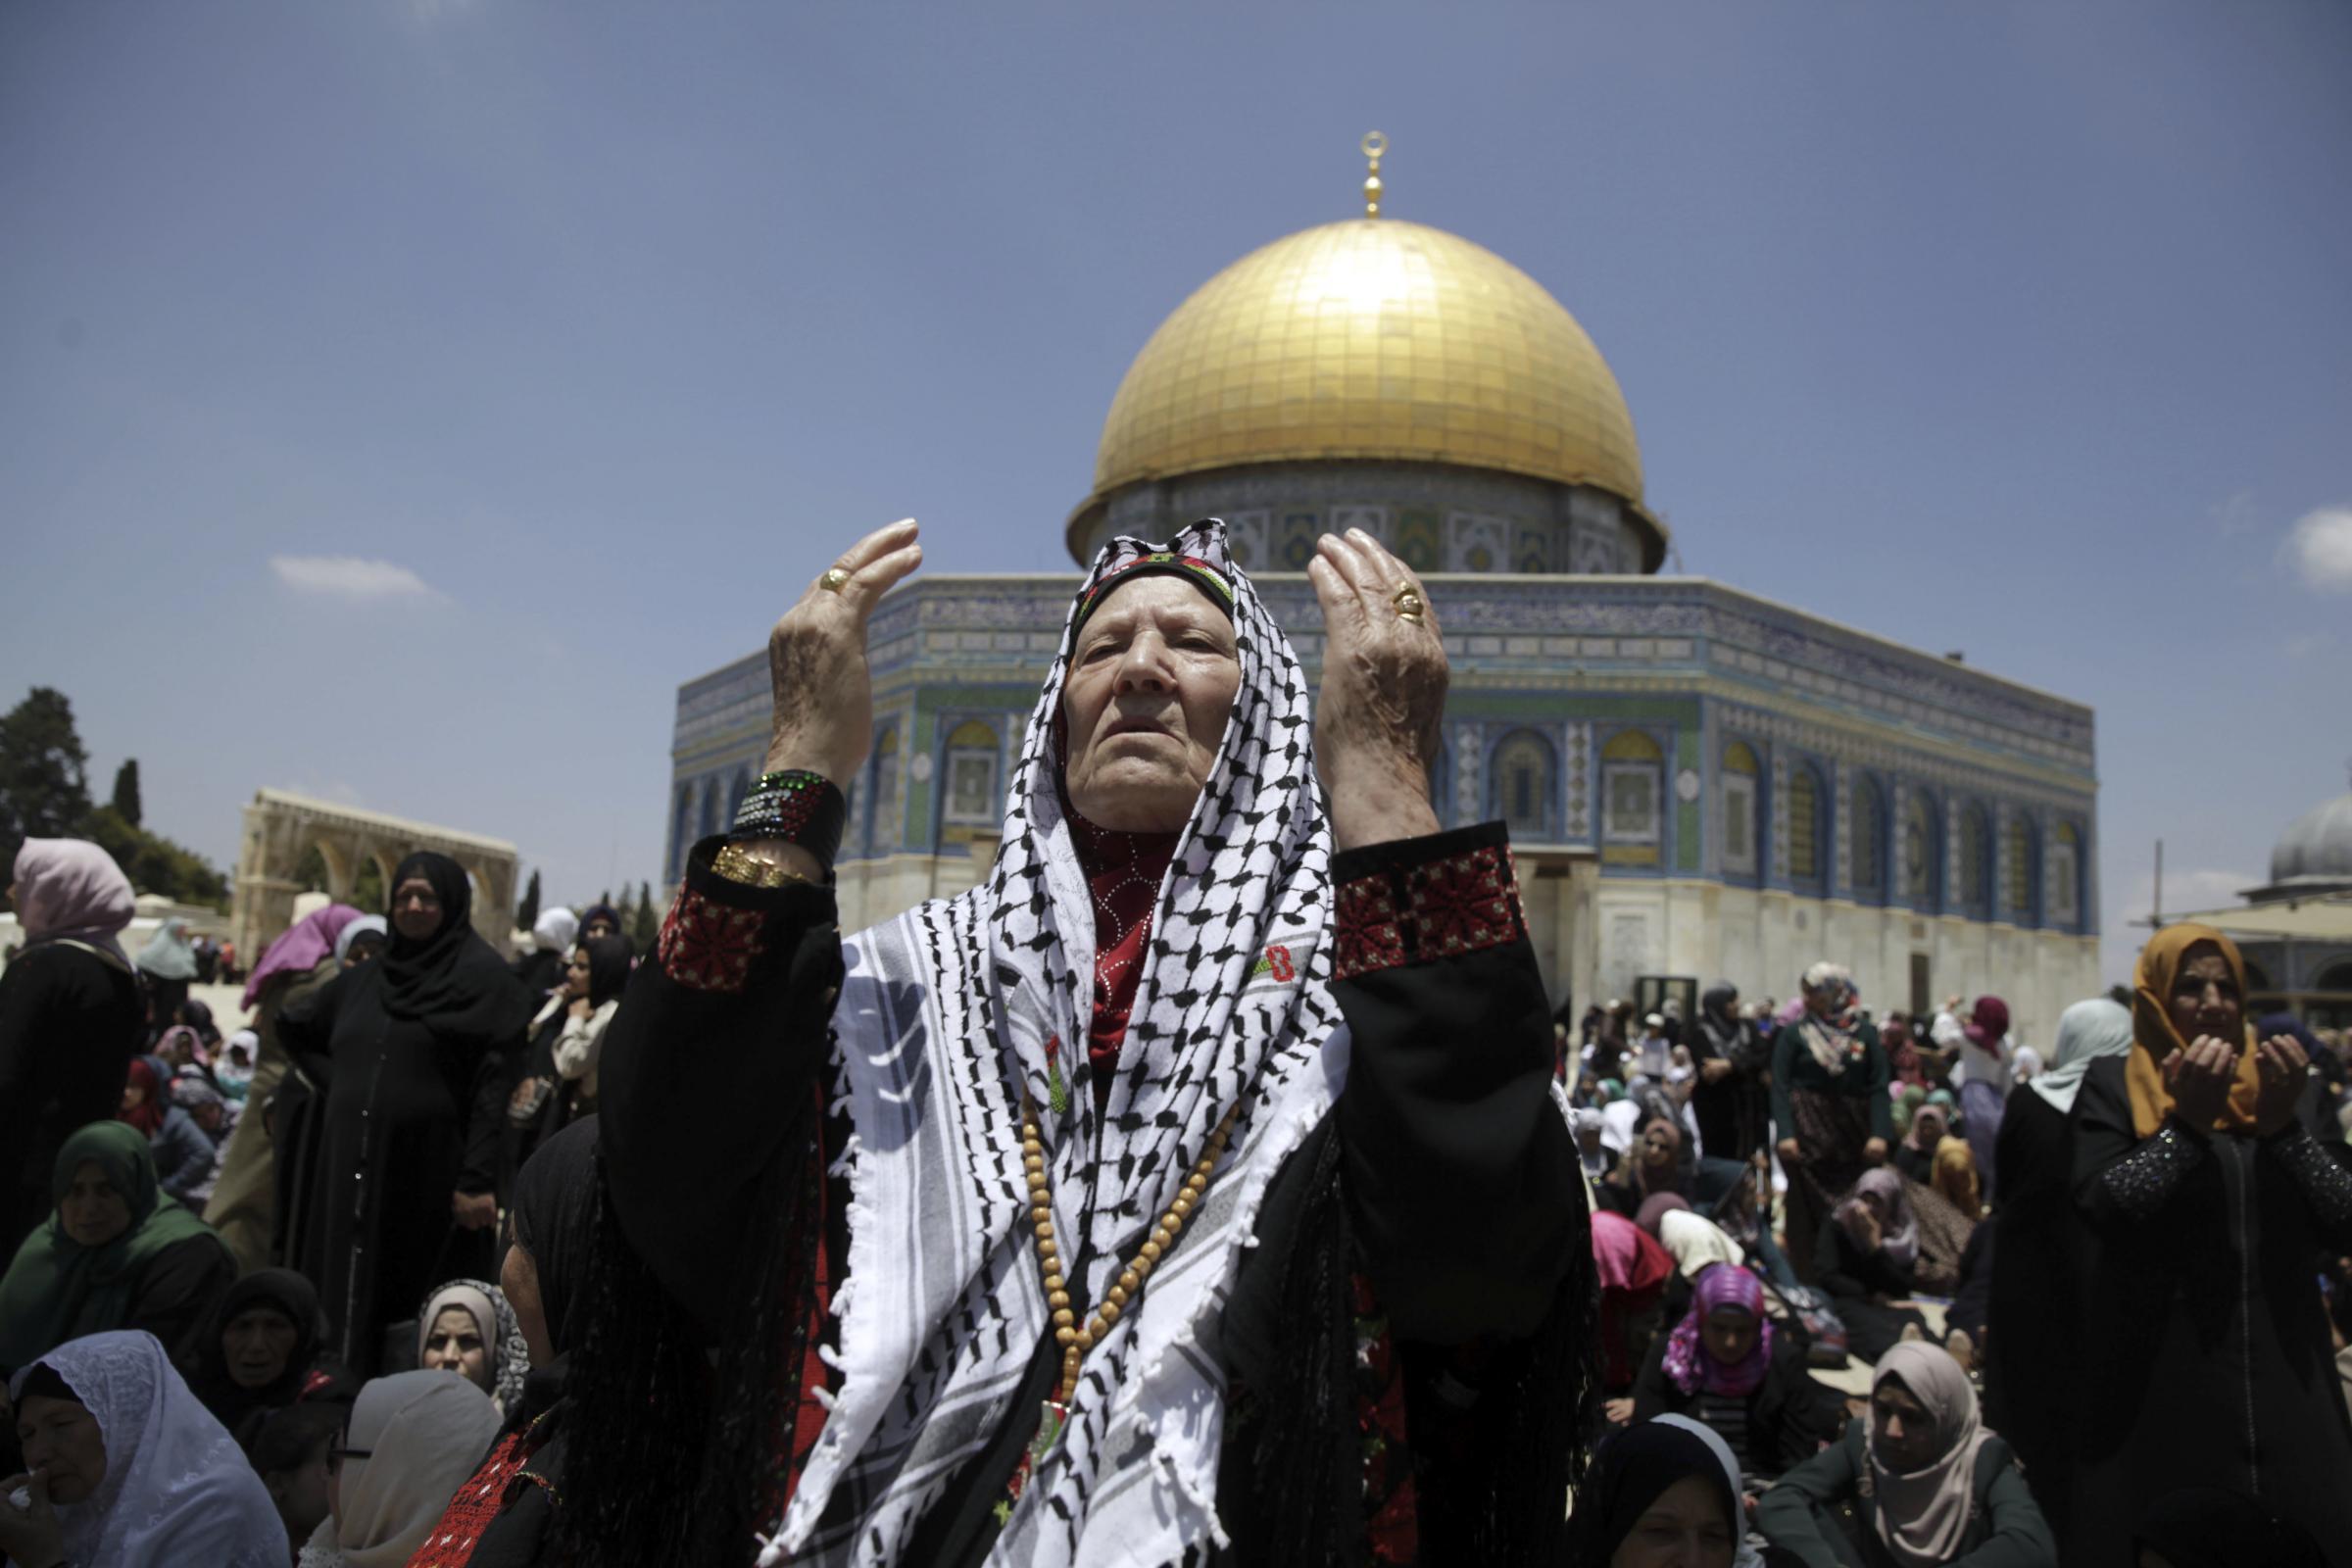 100000 expected at Europe's largest Eid celebration